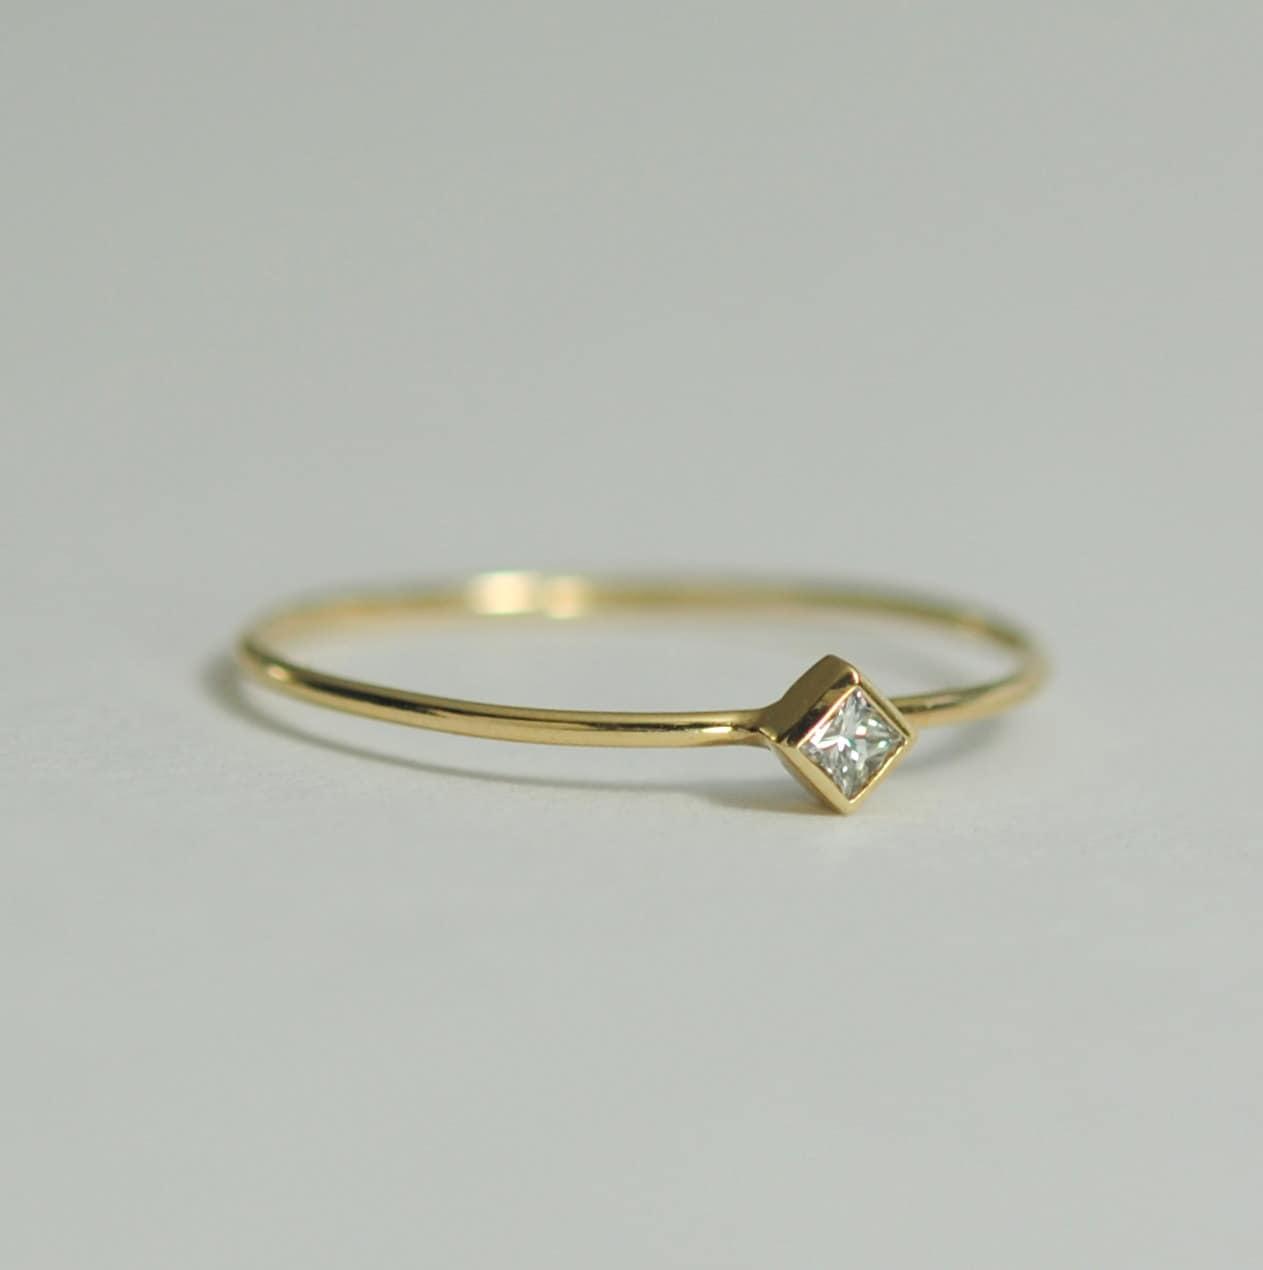 Diamond Engagement Ring 05 Carat Square Diamond 2mm With